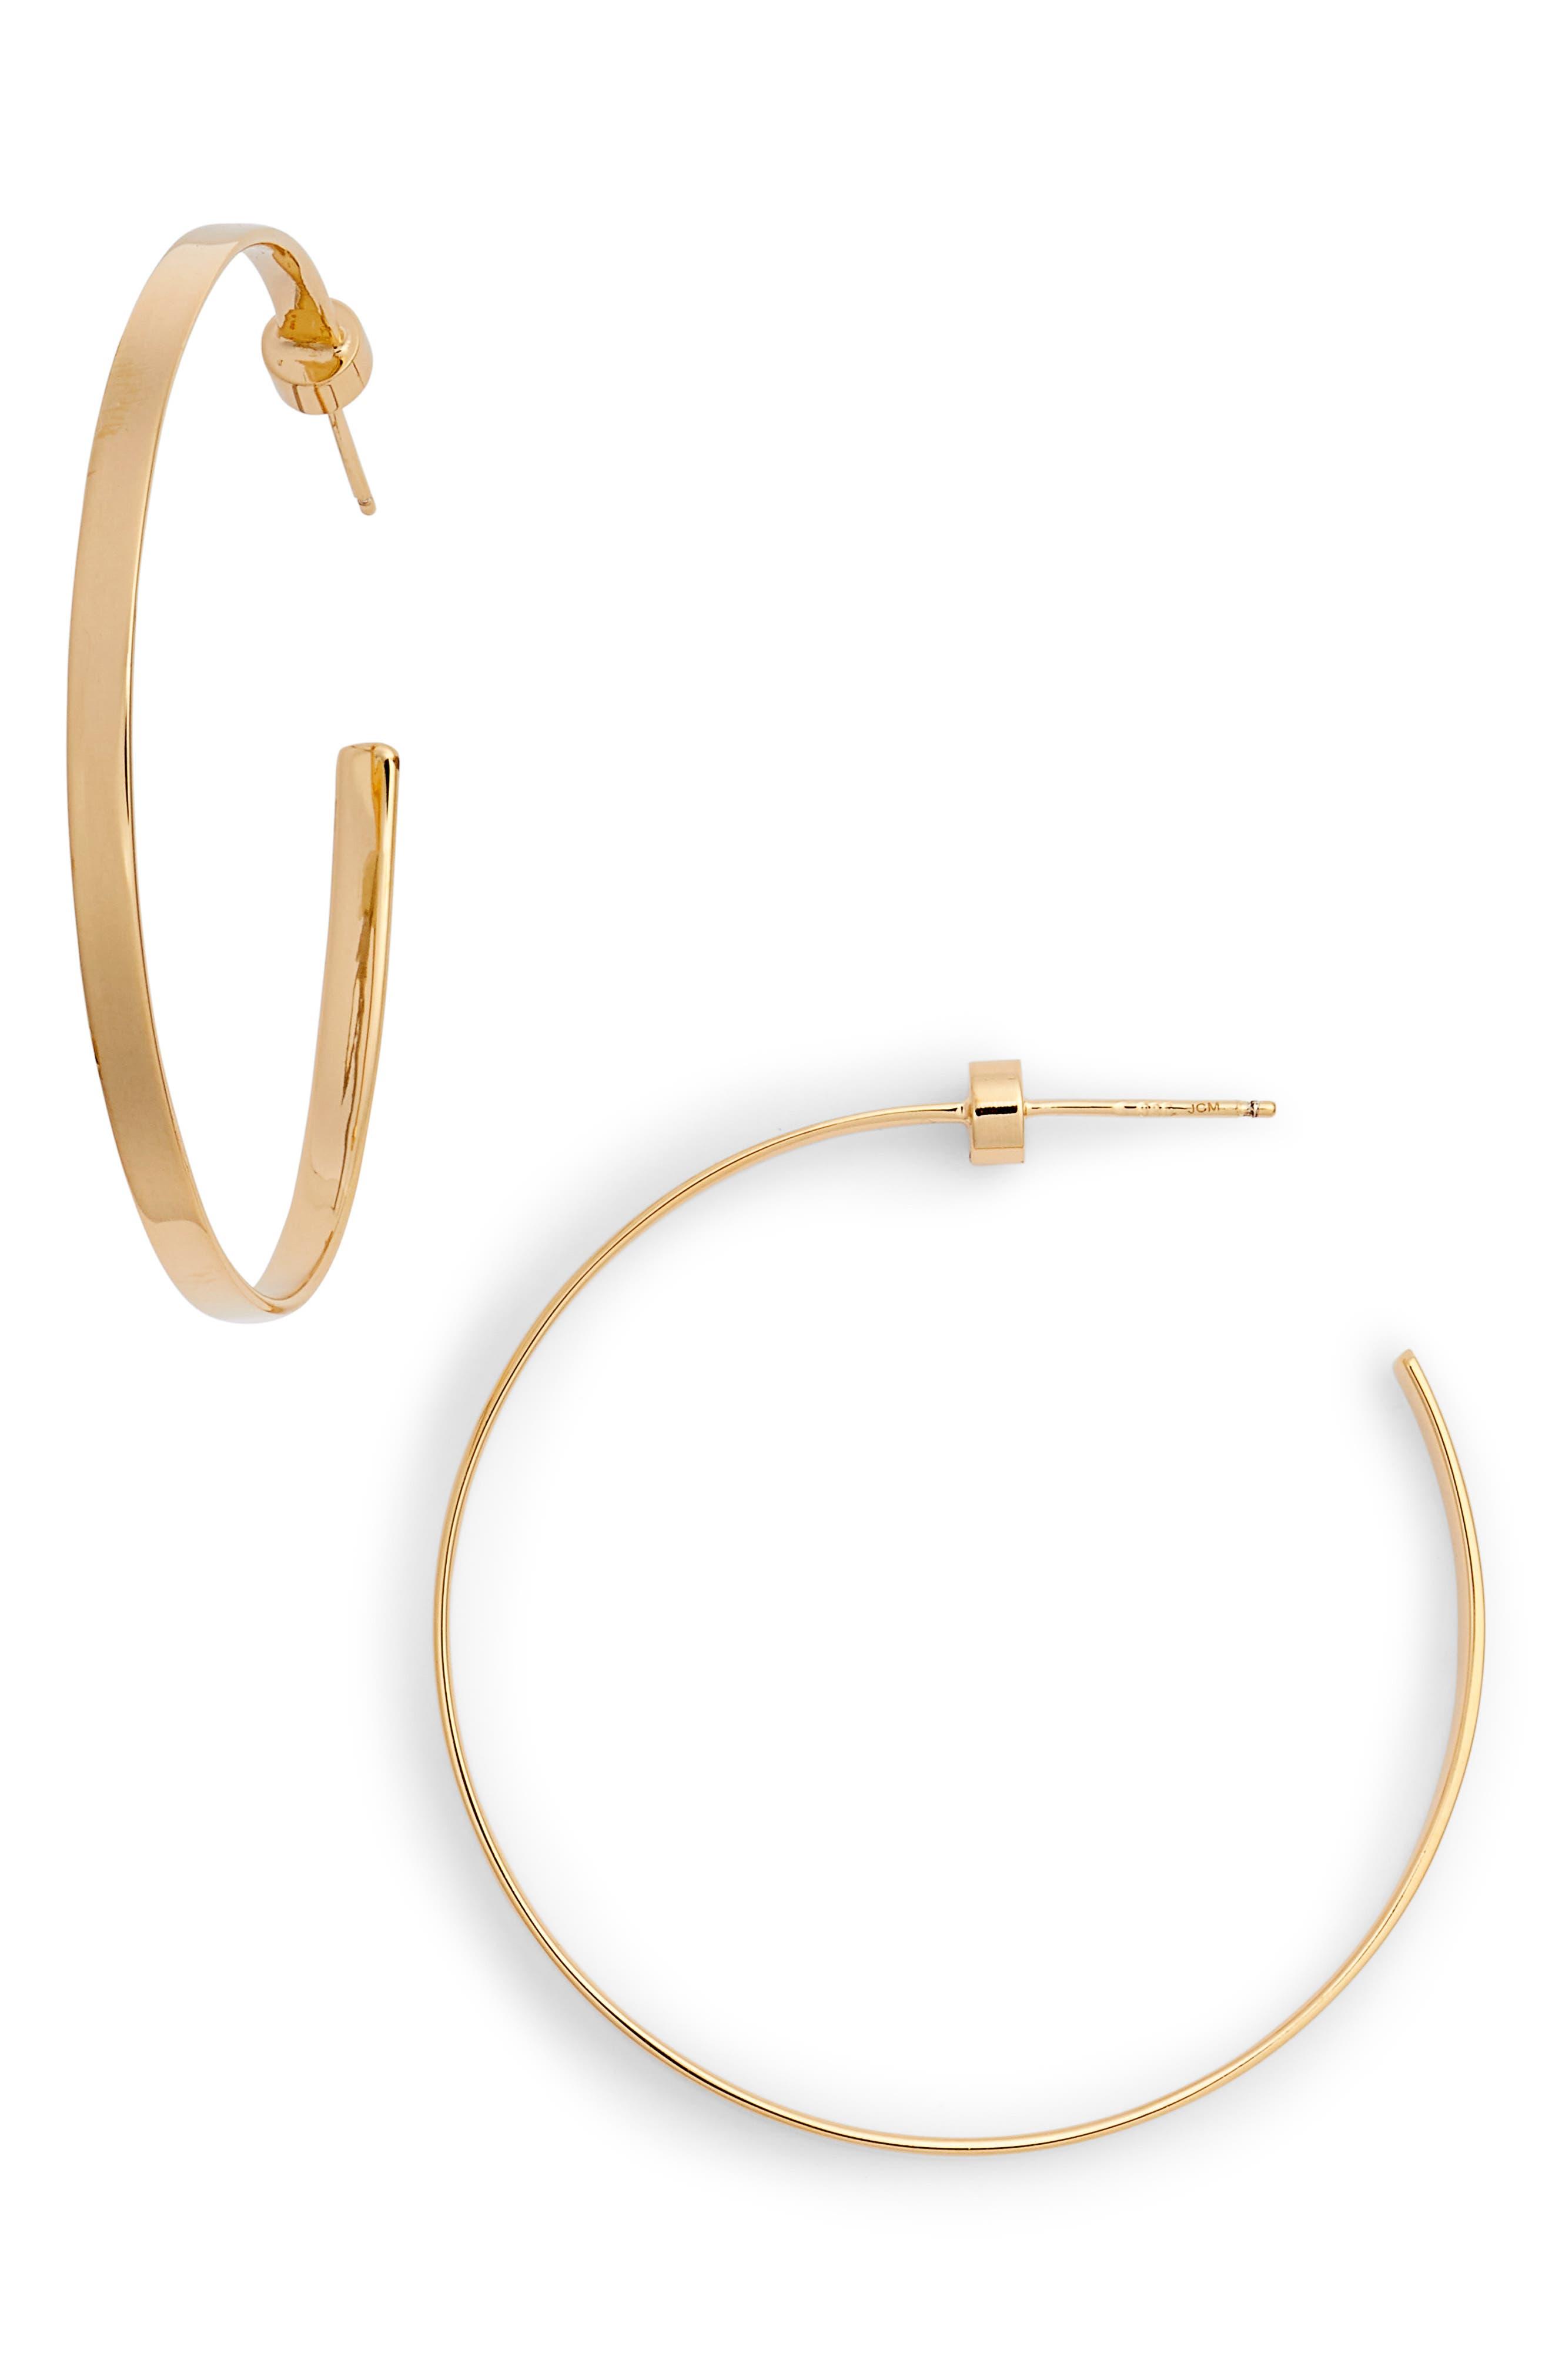 Kiara Hoop Earrings,                             Main thumbnail 1, color,                             Yellow Vermeil